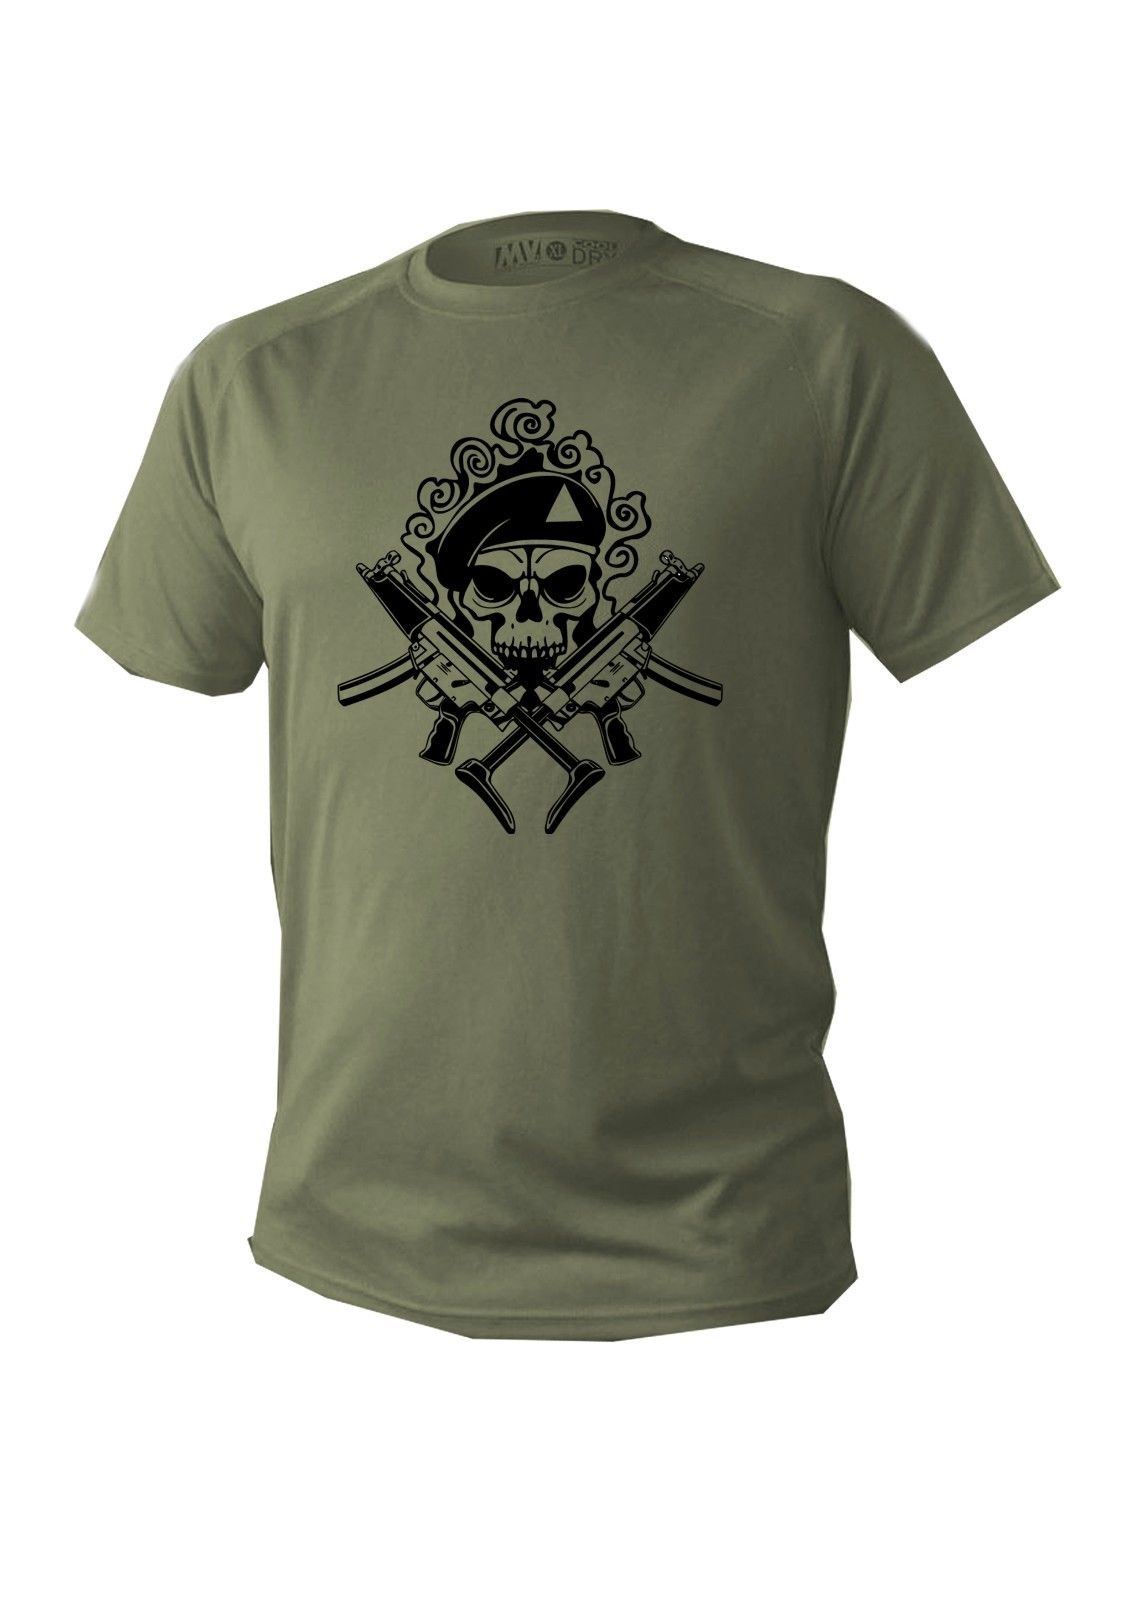 2019 Fashion Cool Men T-shirt T shirt Men man  short sleeve green olive military design army skull new